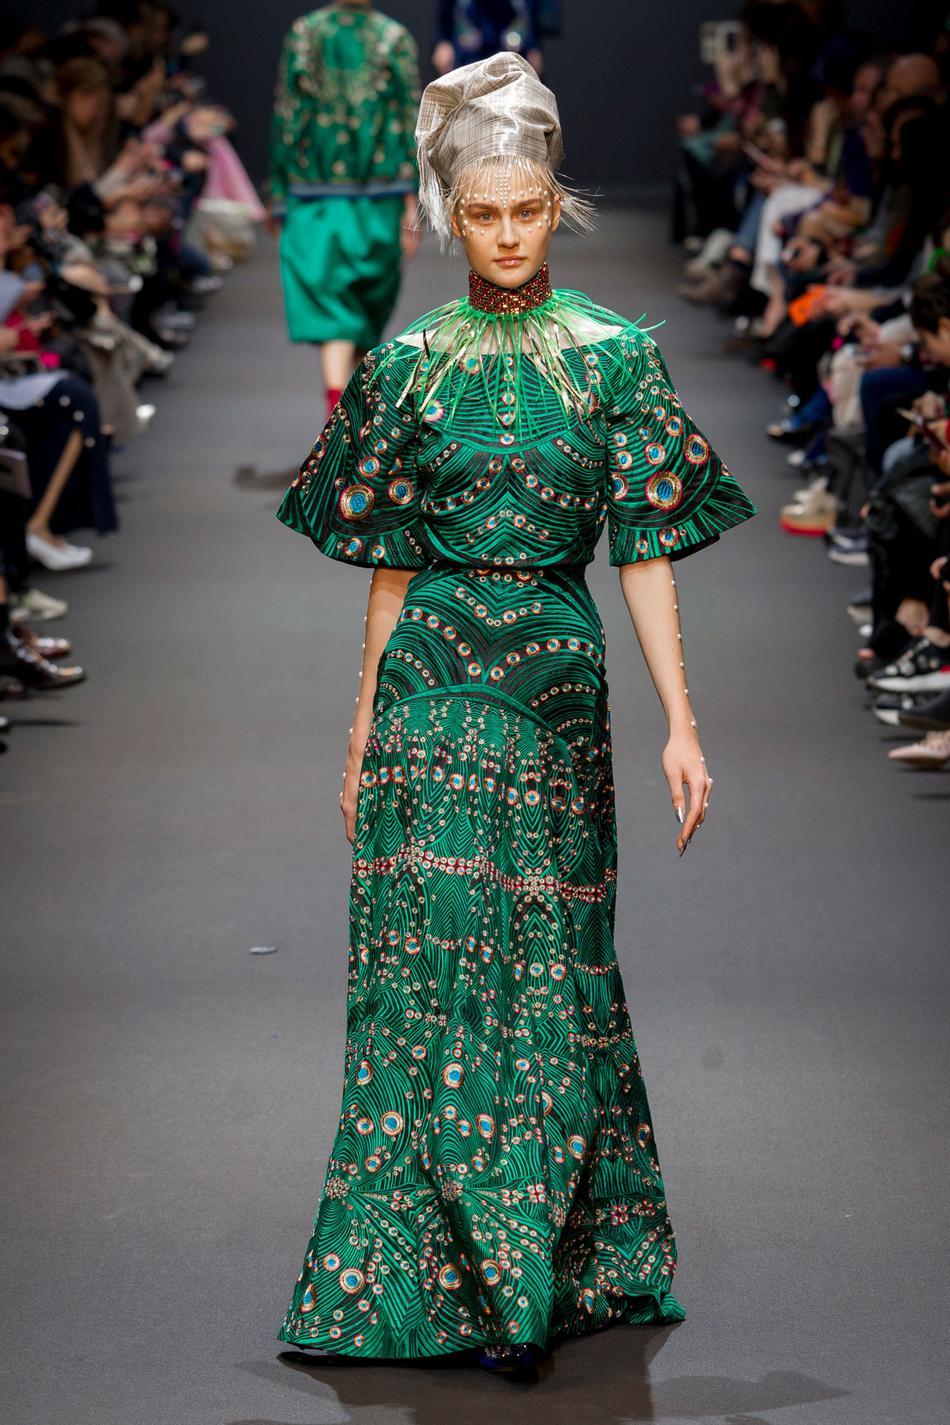 Défilé Manish Arora Fashion Week 2017 - Look 34